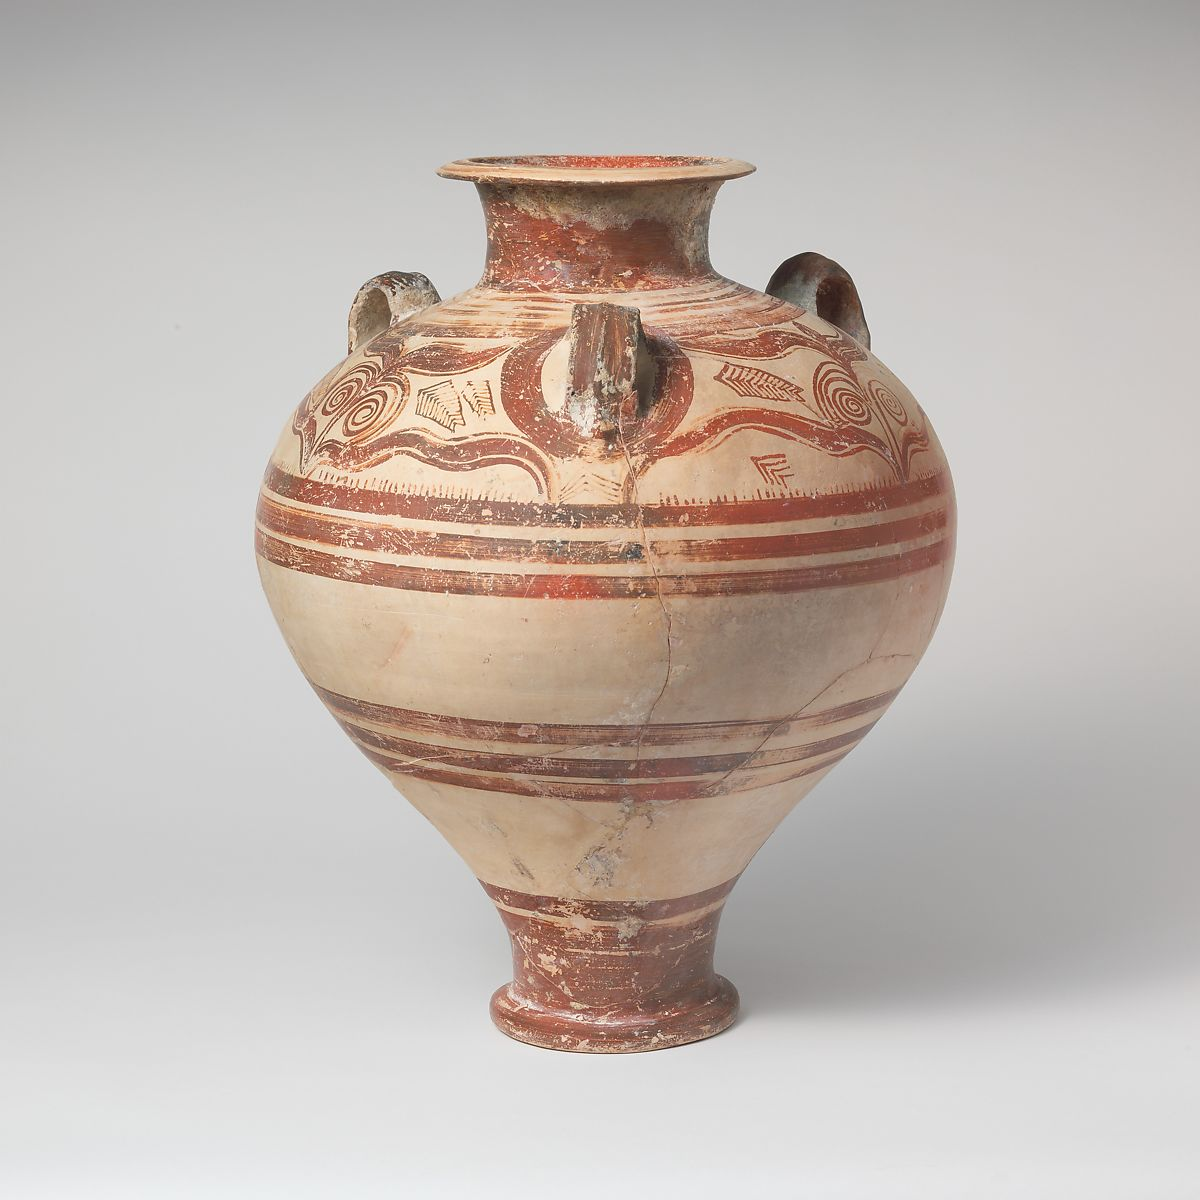 Terracotta pithoid jar | Mycenaean | Late Helladic IIIA2 early | The Met